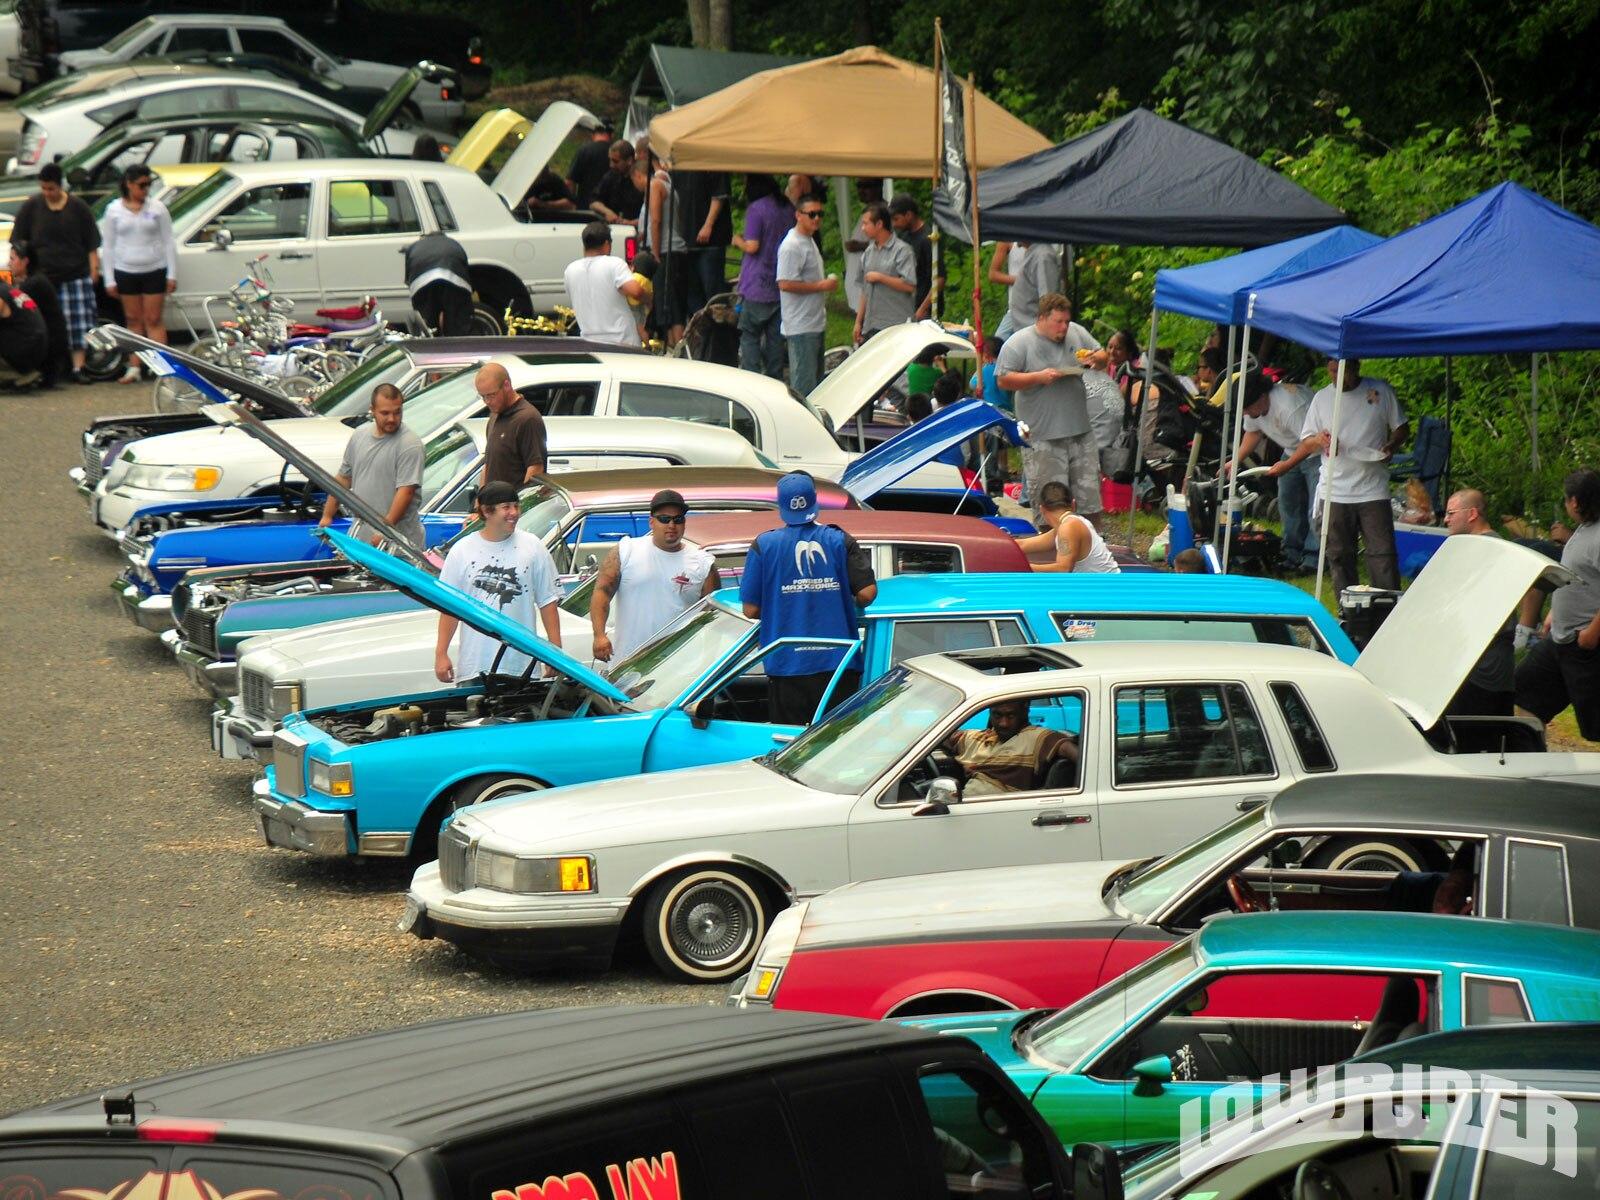 1201-lrmp-02-o-street-dreamz-picnic-show-cars1